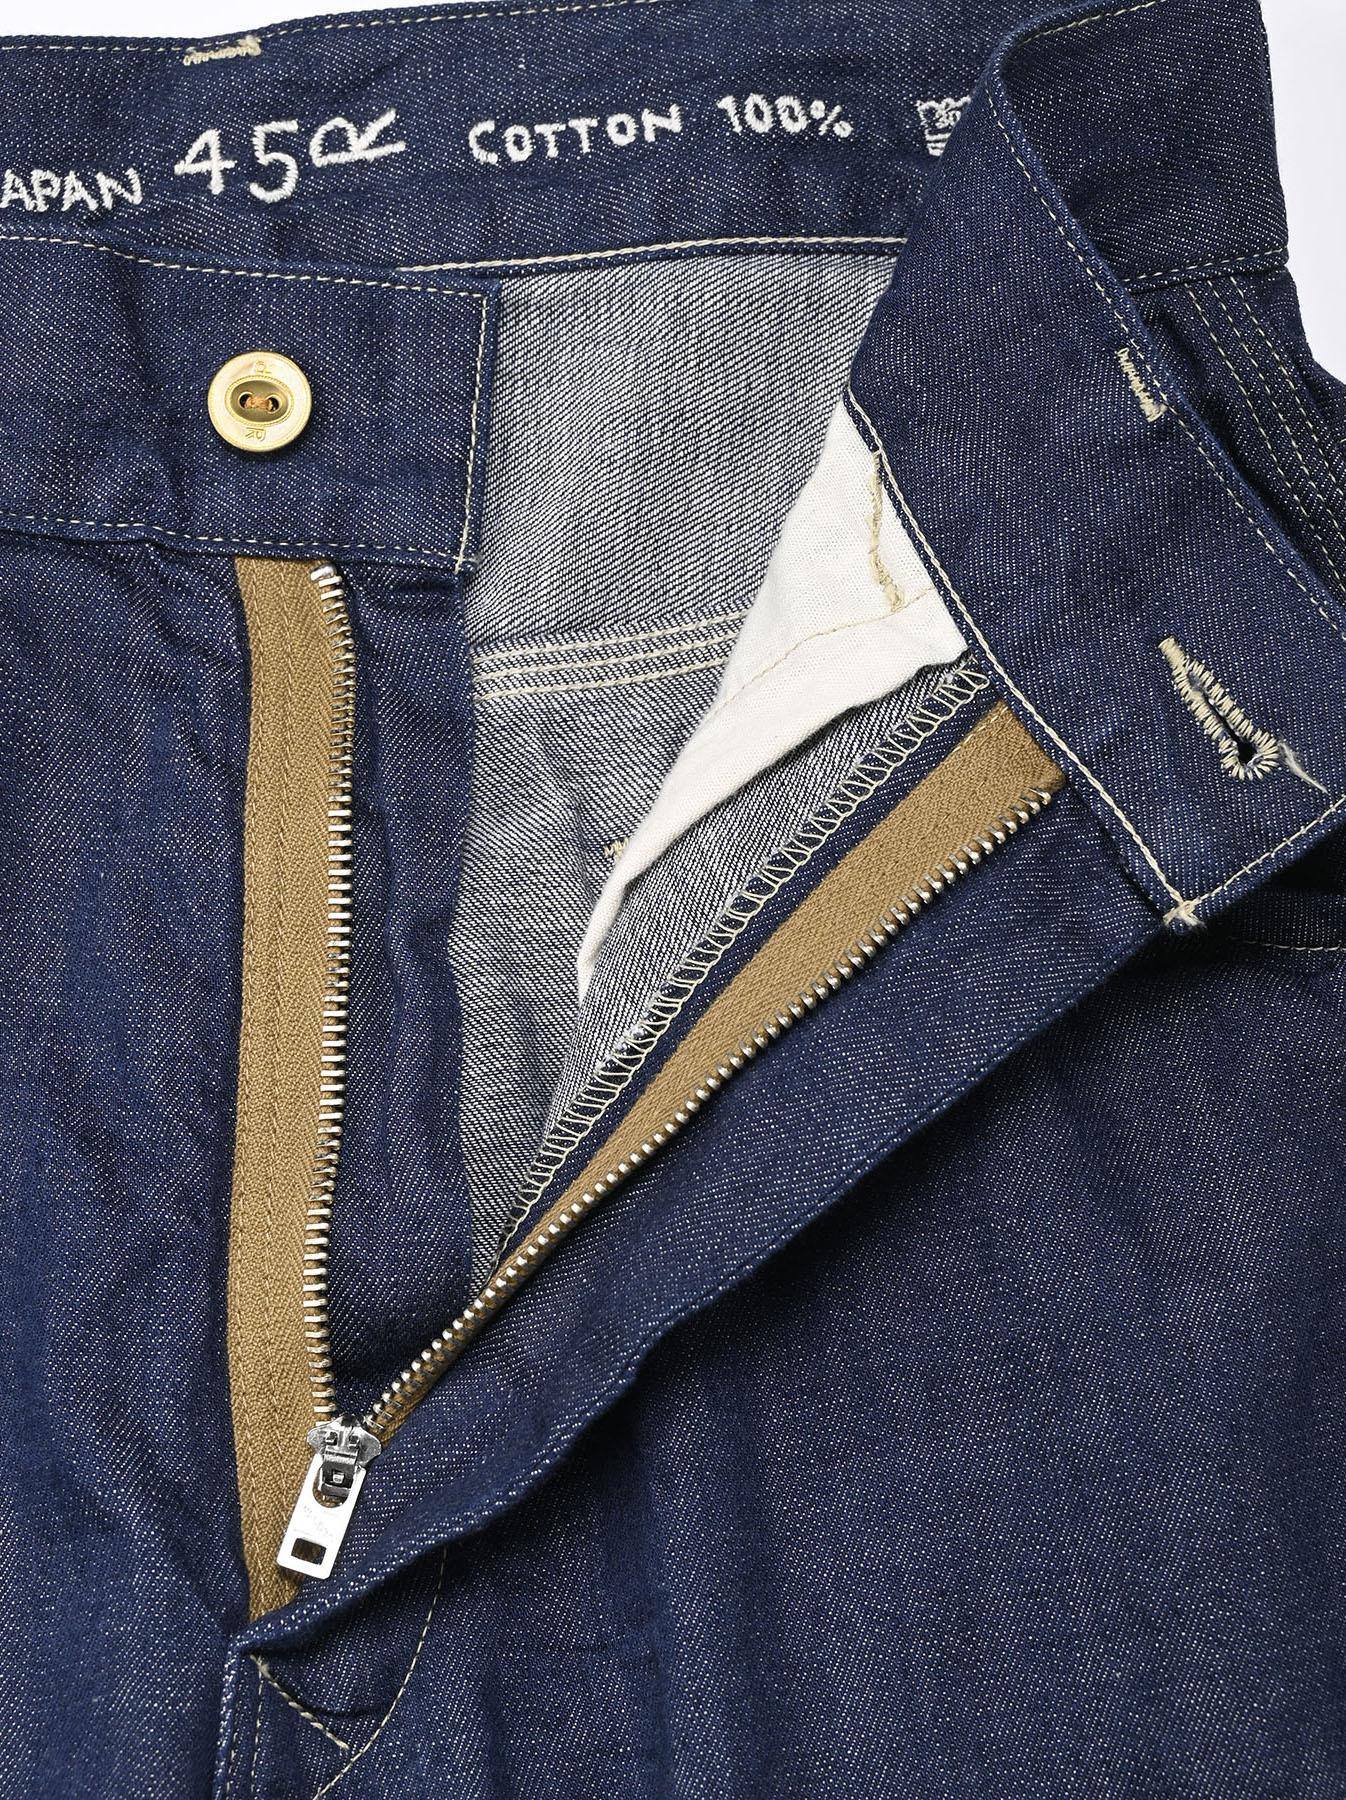 Indigo Nou 908 Painter Pants (0721)-8